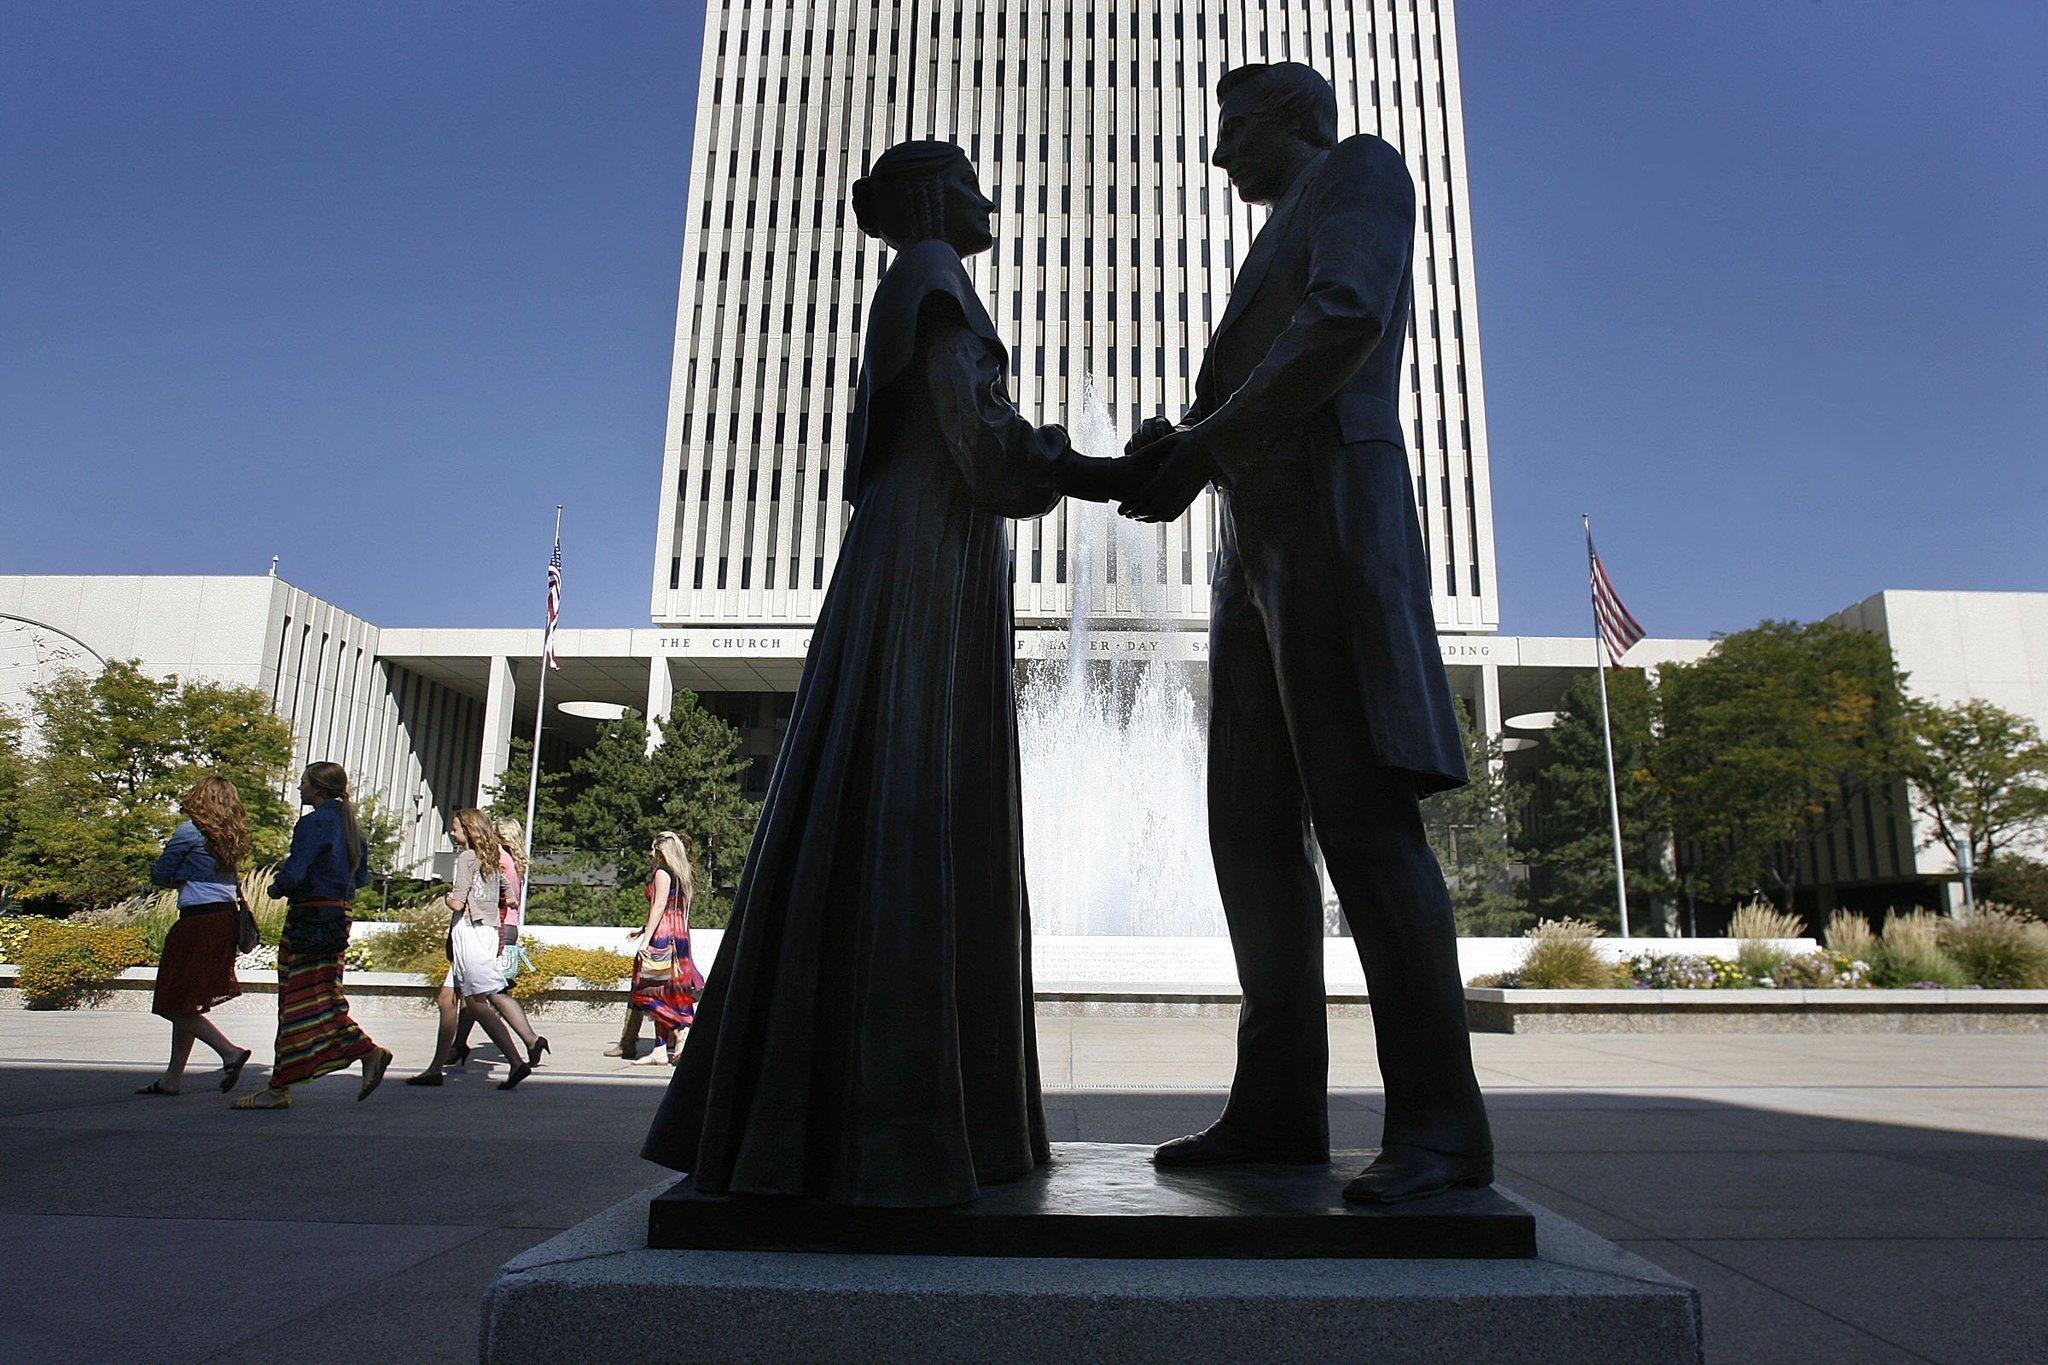 mormon founder had teen bride during polygamy days the san diego  mormon founder had teen bride during polygamy days the san diego union tribune